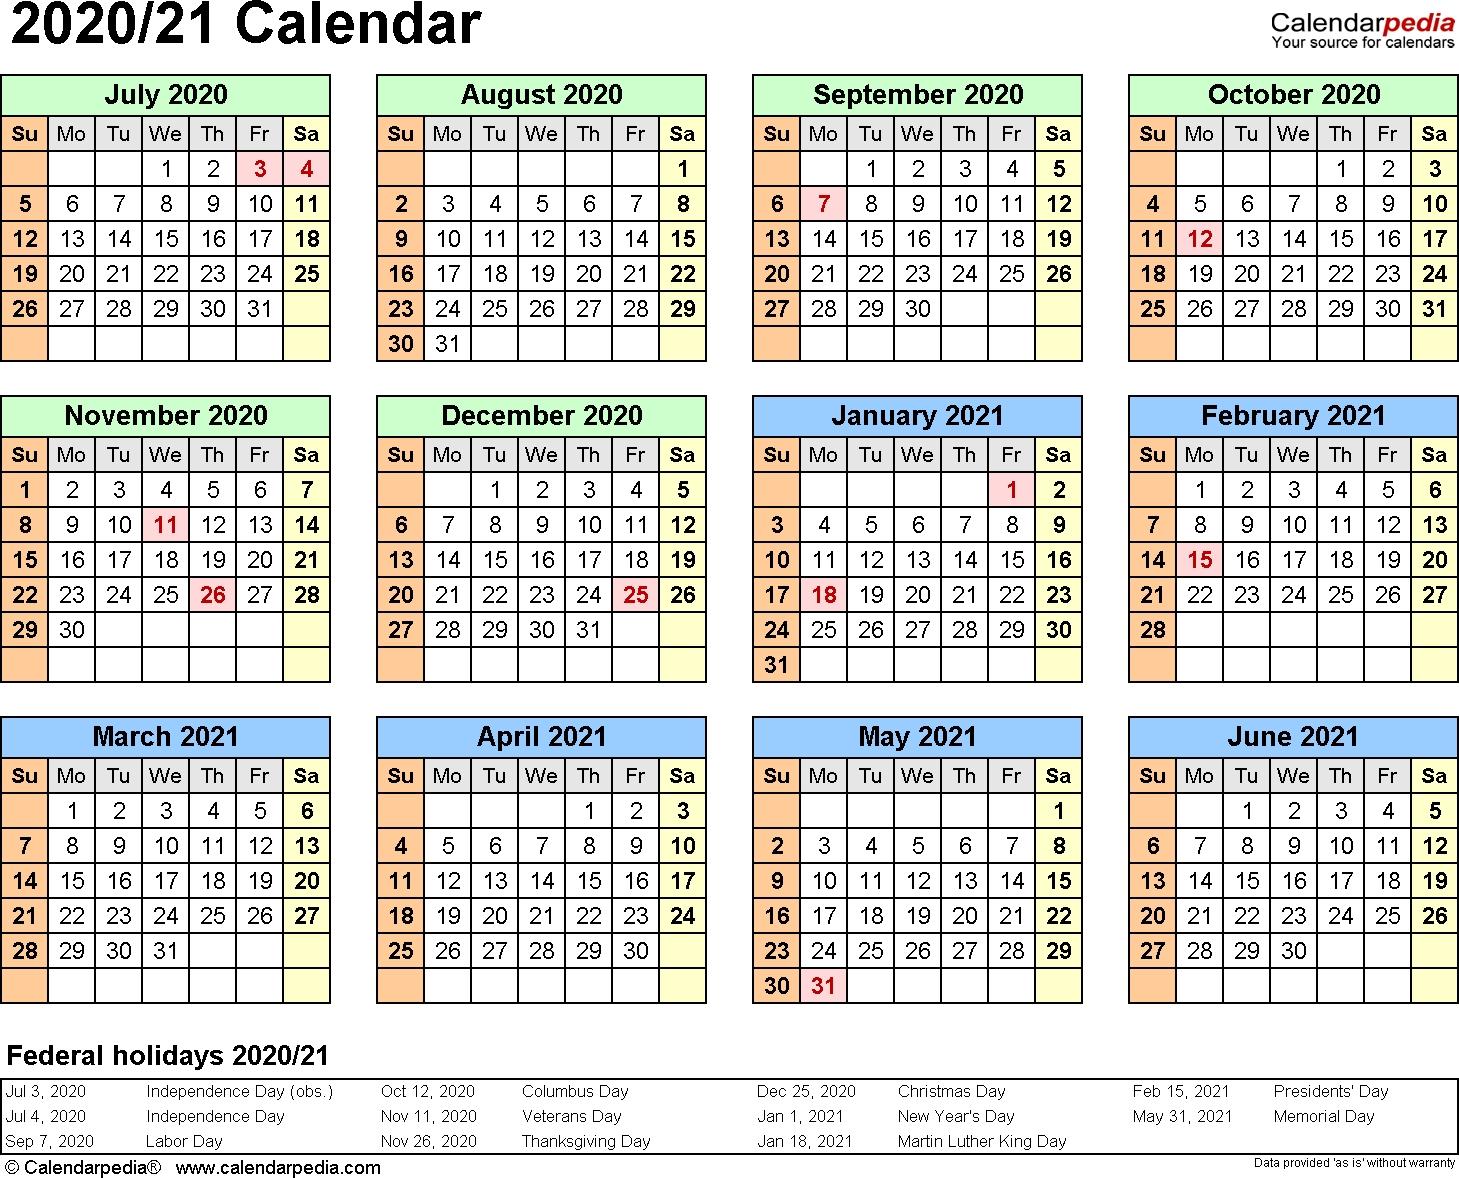 Split Year Calendar 2020/21 (July To June) - Word Templates regarding Year At A Glance Calendar 2020